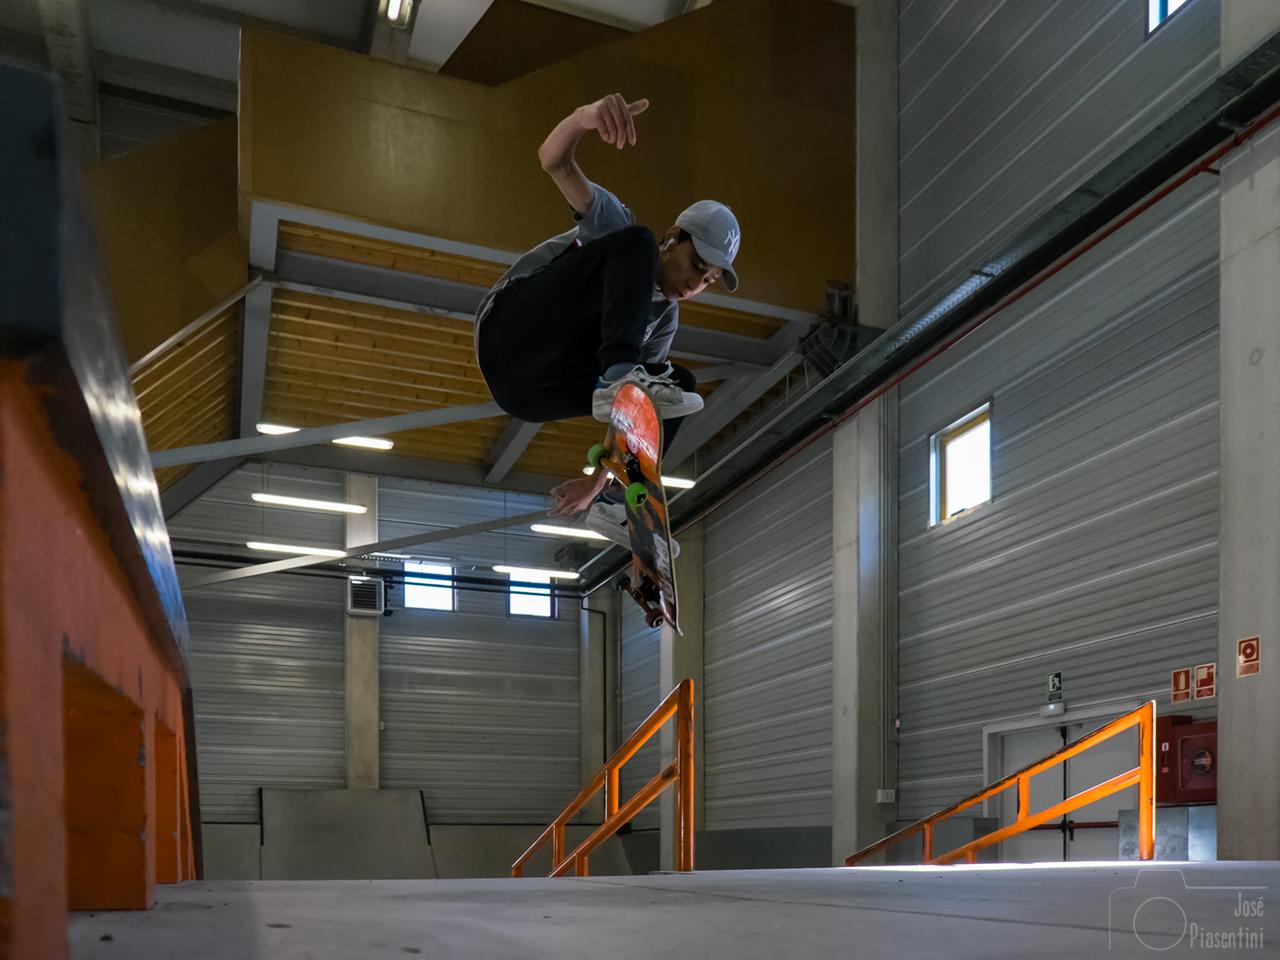 Skate-Indoor-Center-Andorra